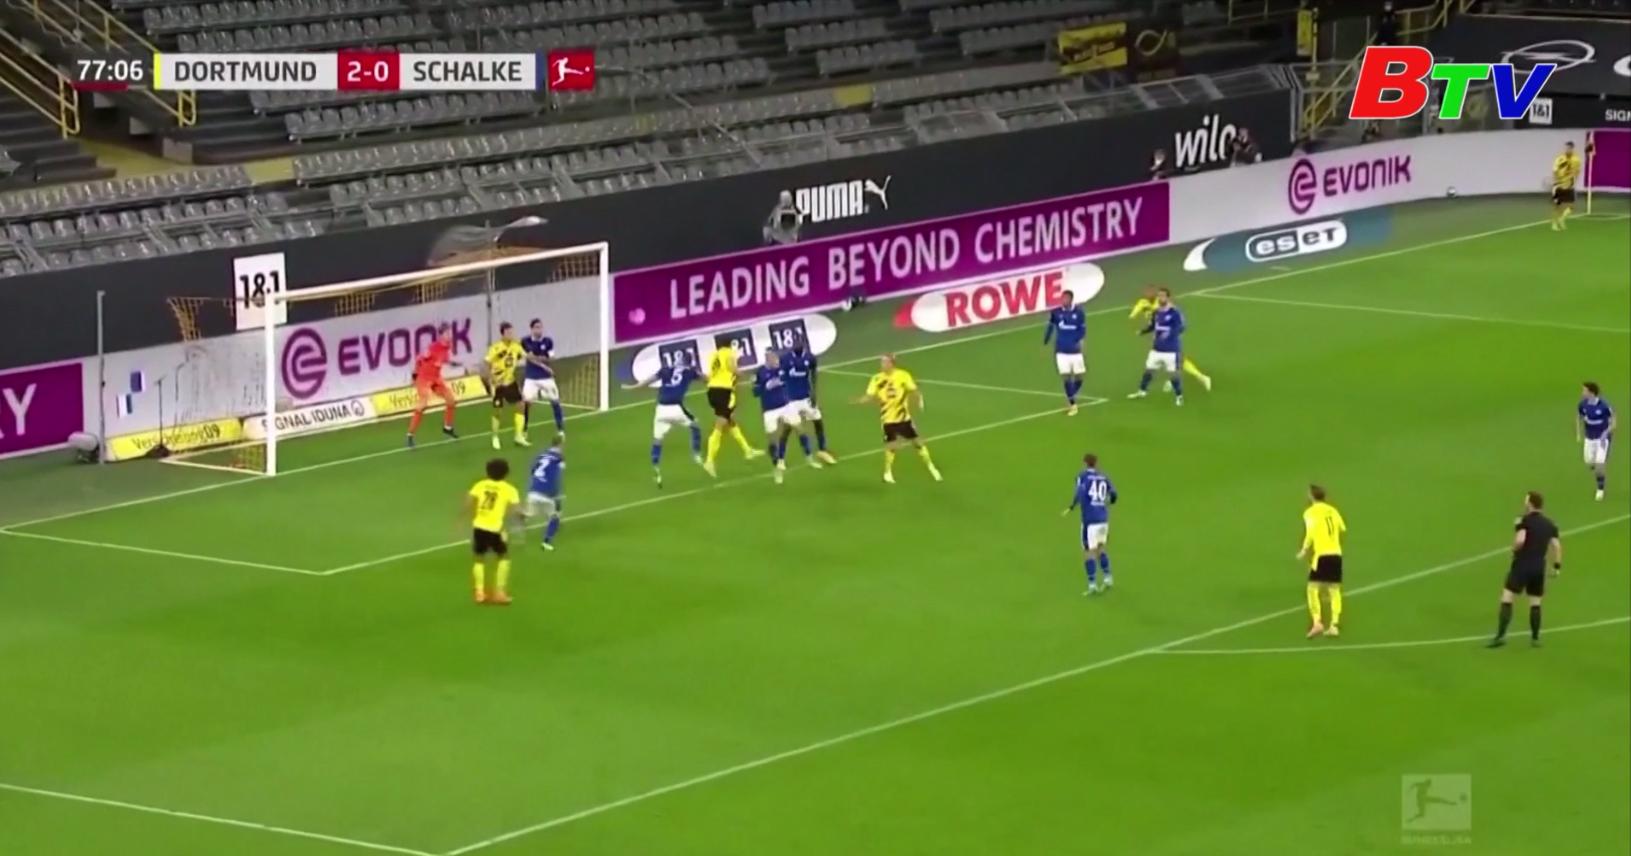 Vòng 5 Bundesliga – Borussia Dortmund 3-0 Schalke